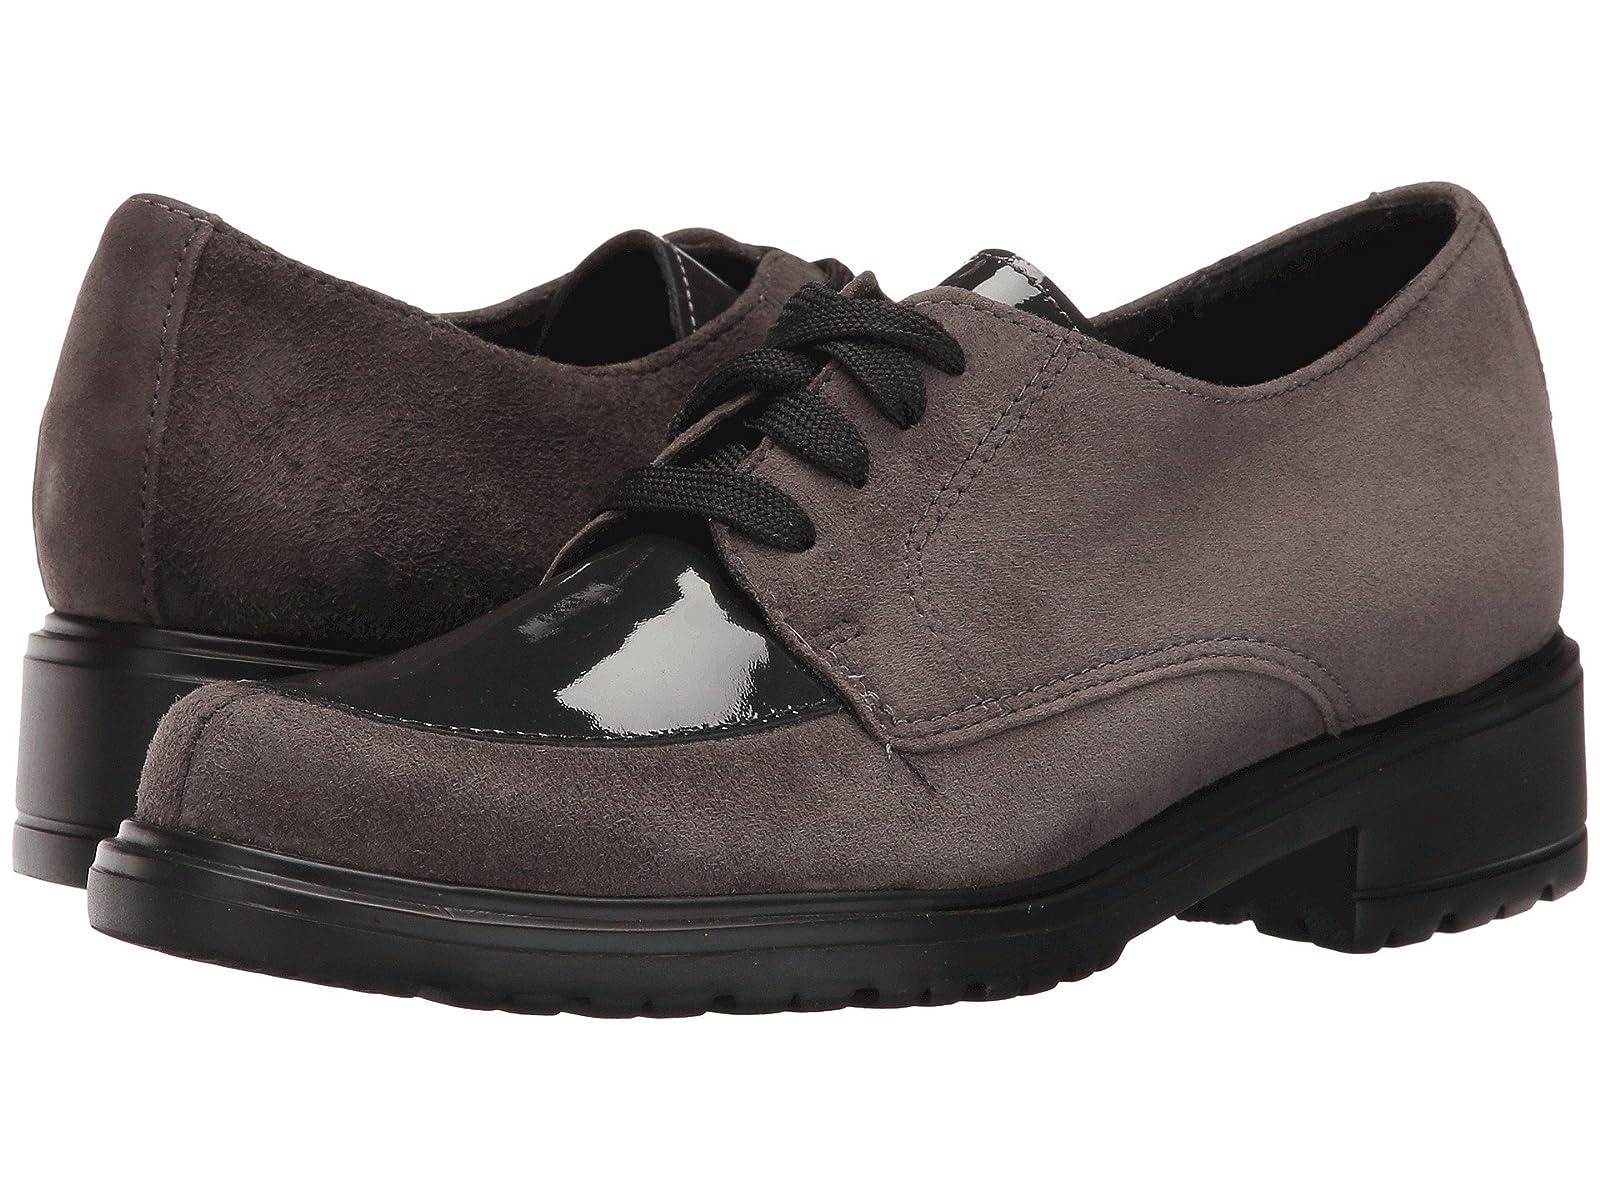 Munro VerandaCheap and distinctive eye-catching shoes